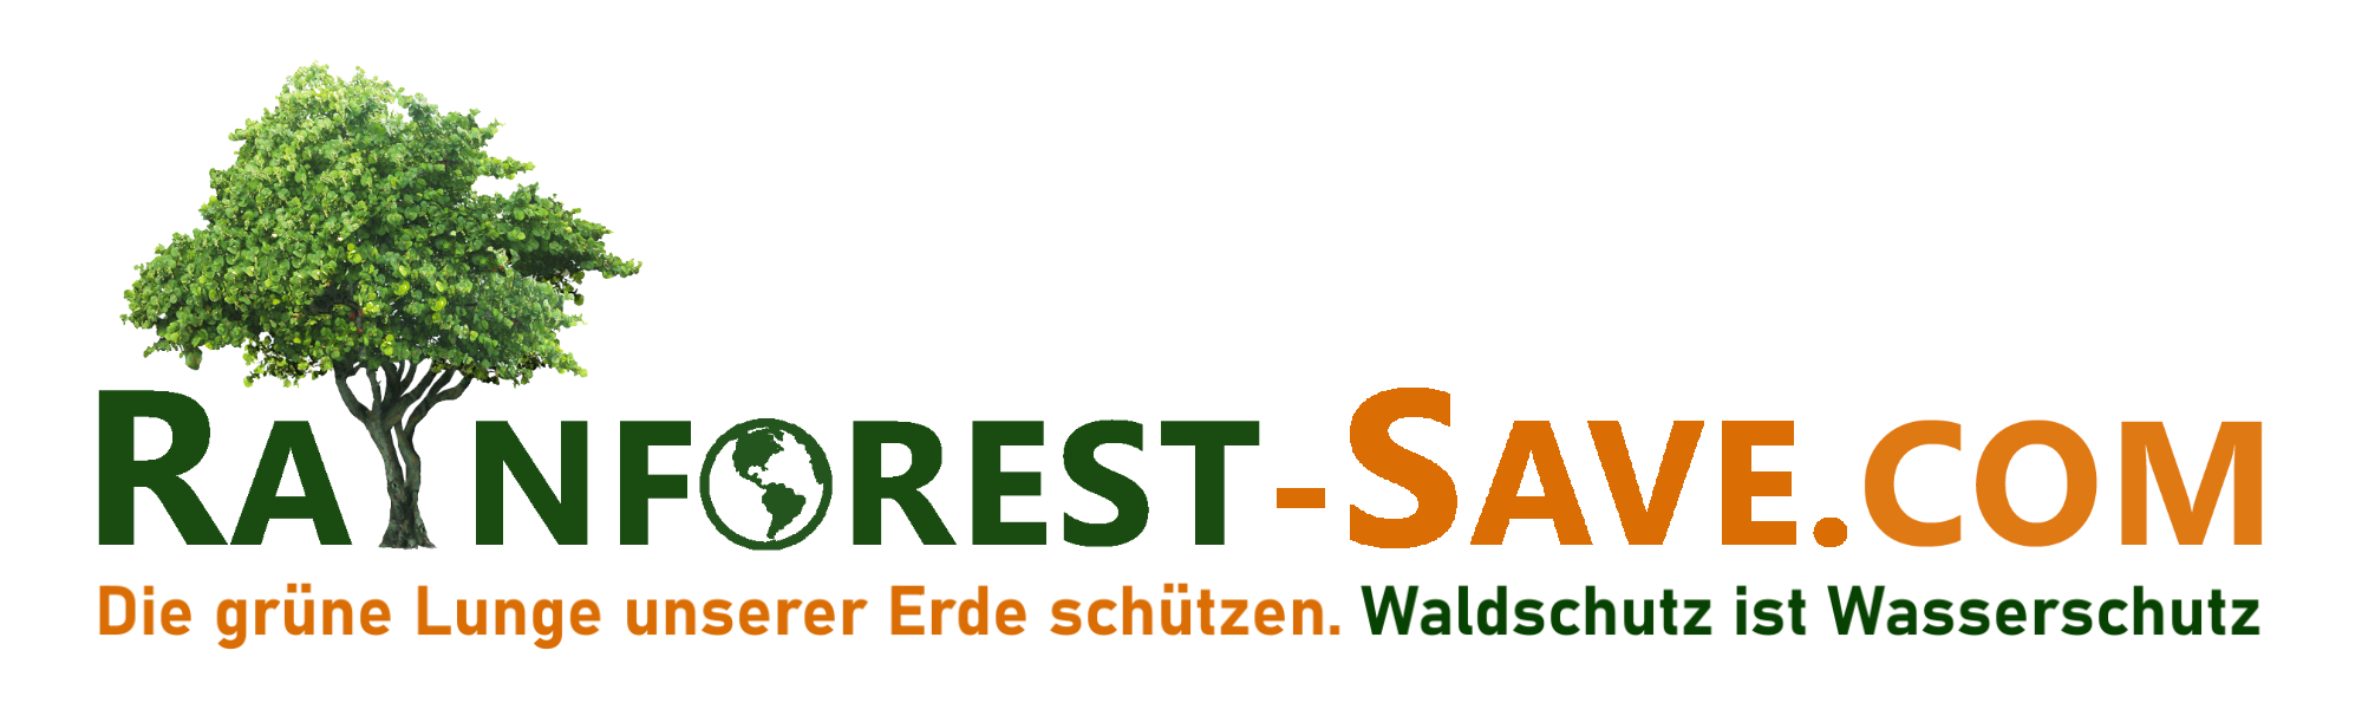 Rainforest-Save